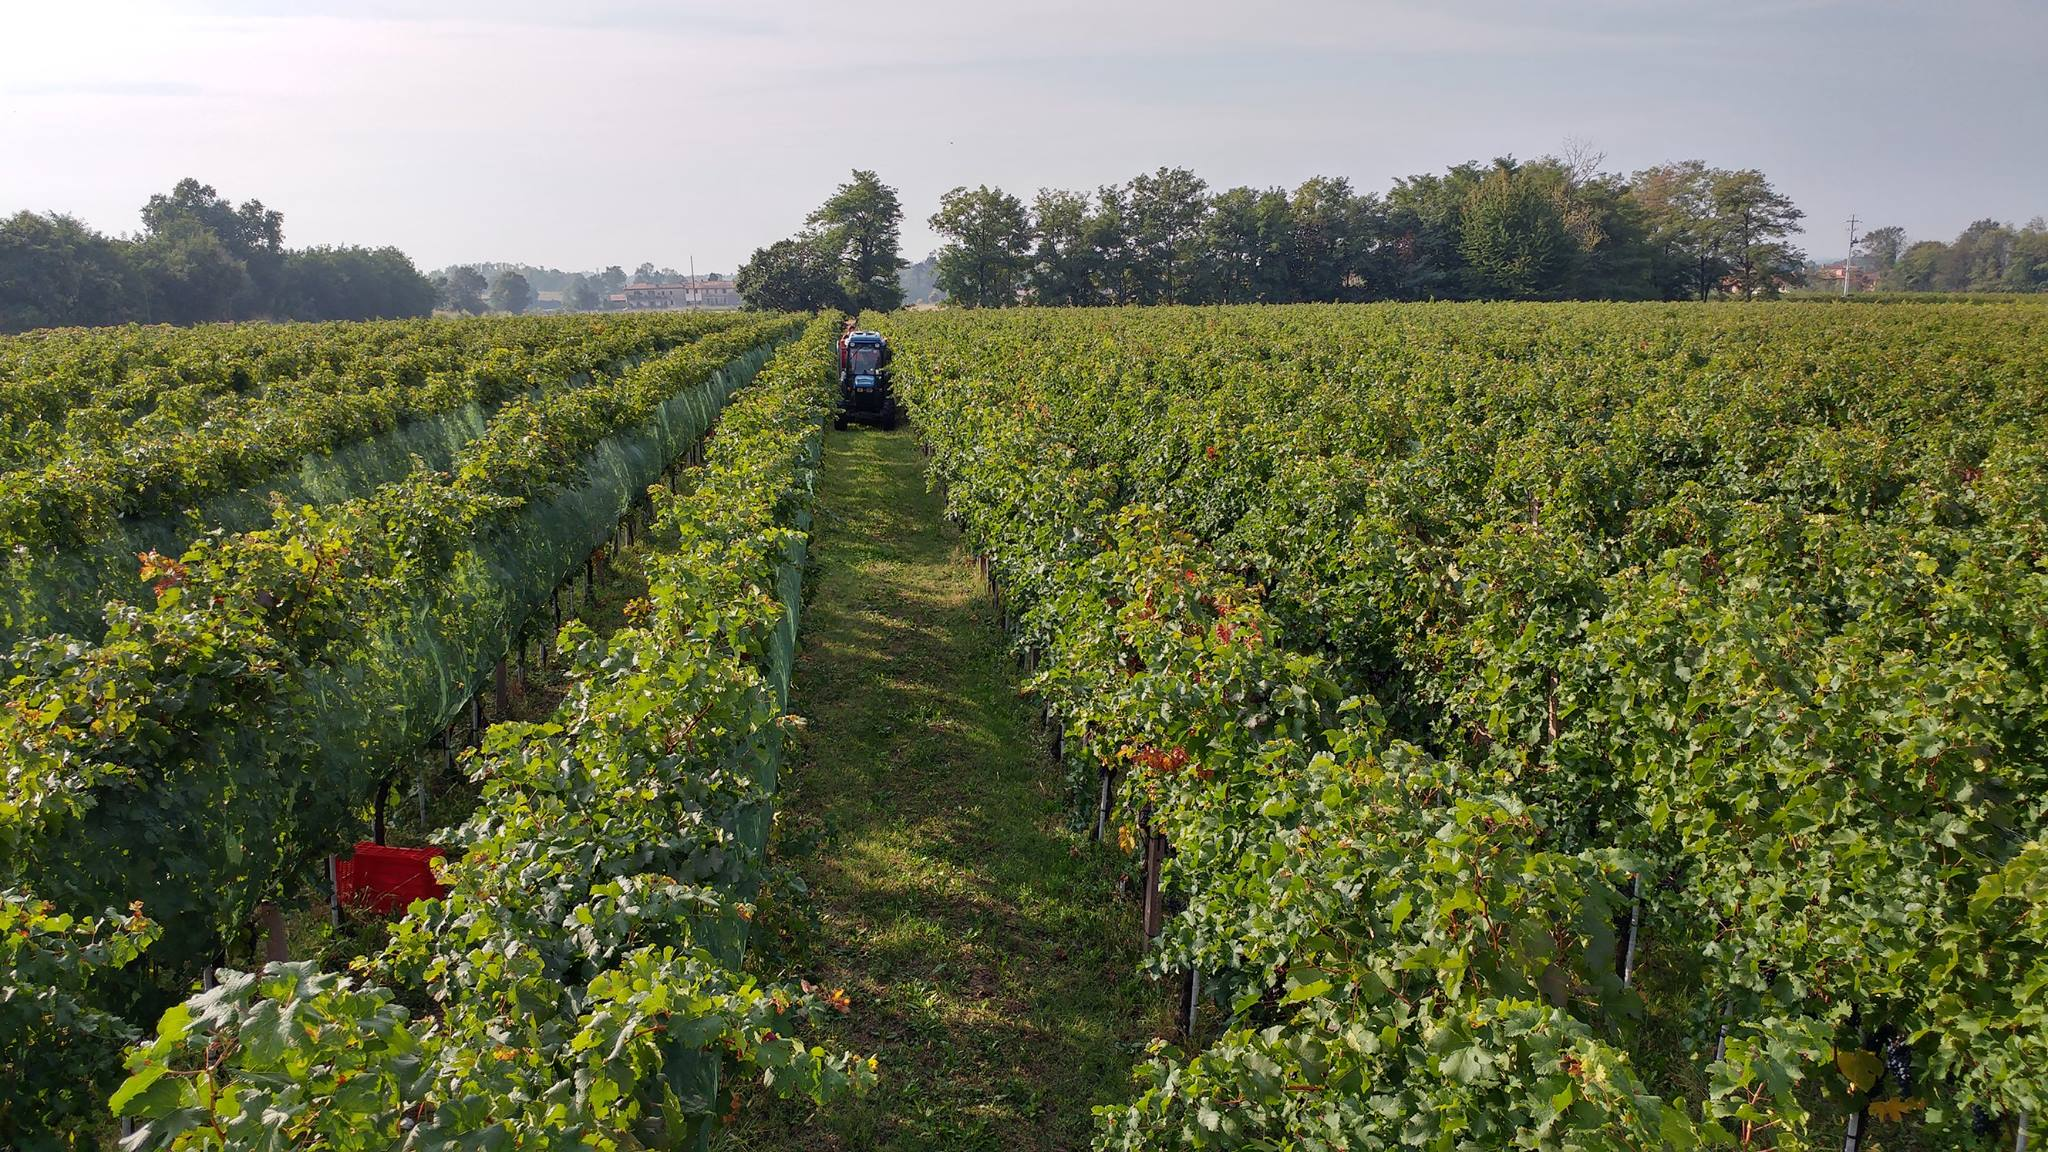 Cantine del Barone's vineyard